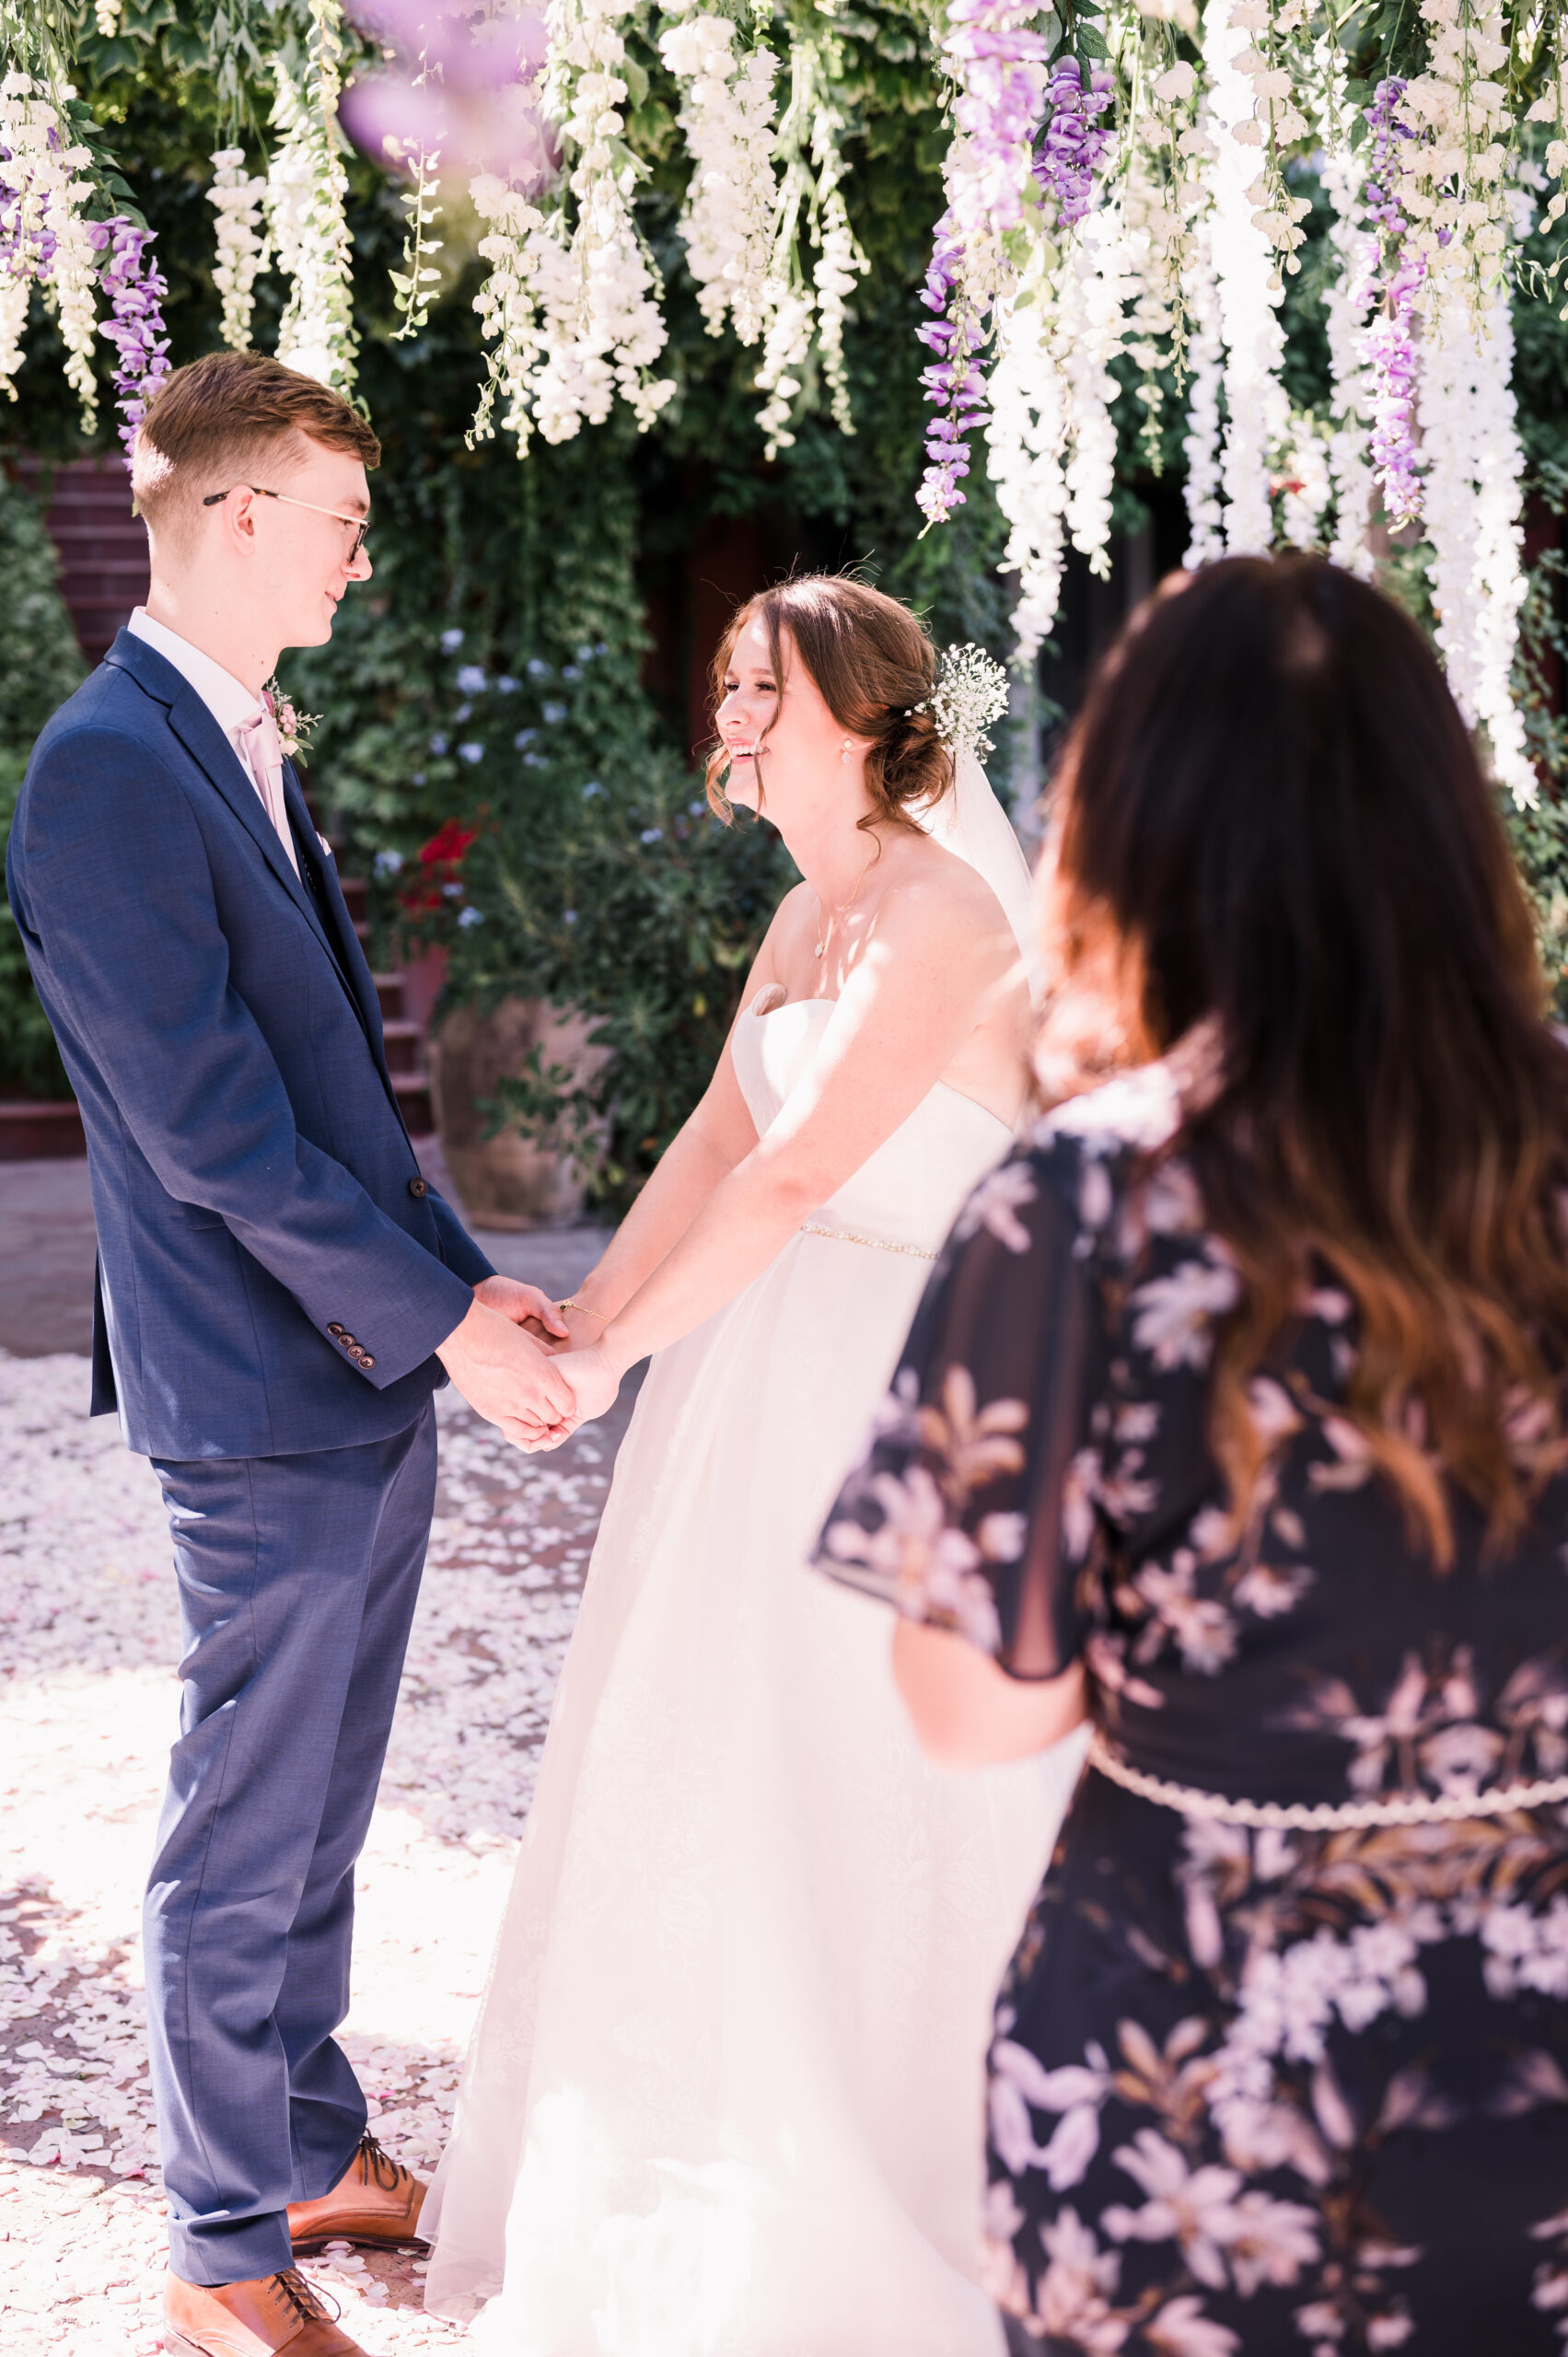 Ben and Holly wedding in Maiori, Amalfi Coast, Italy (6)